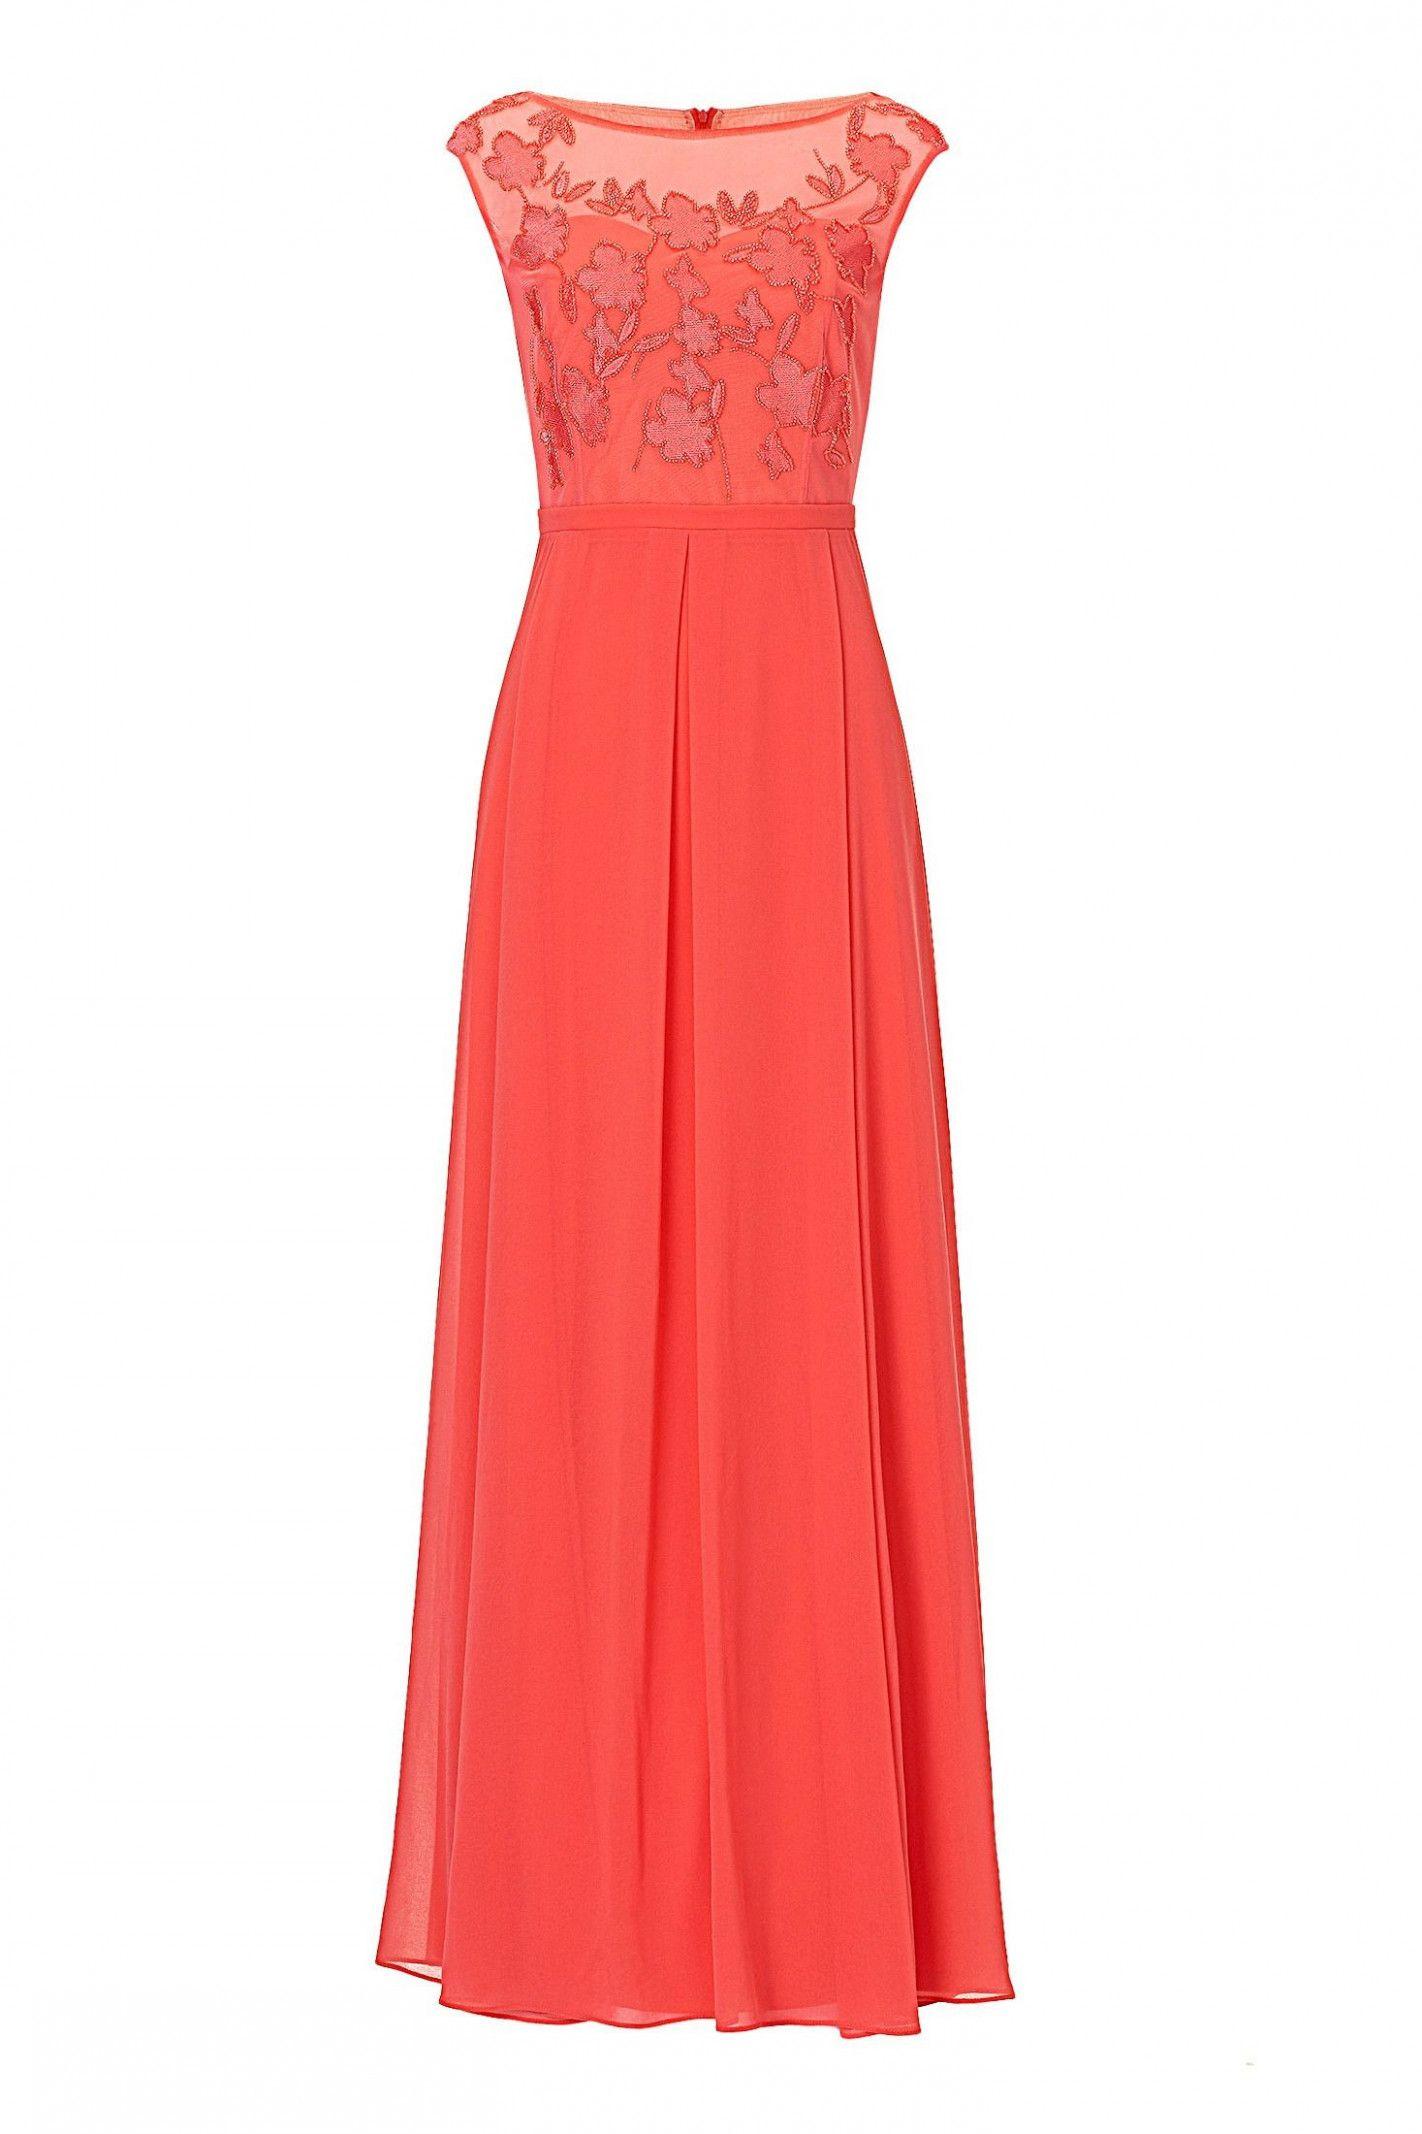 3 Langes Kleid Koralle in 3  Lange kleider, Abendkleid